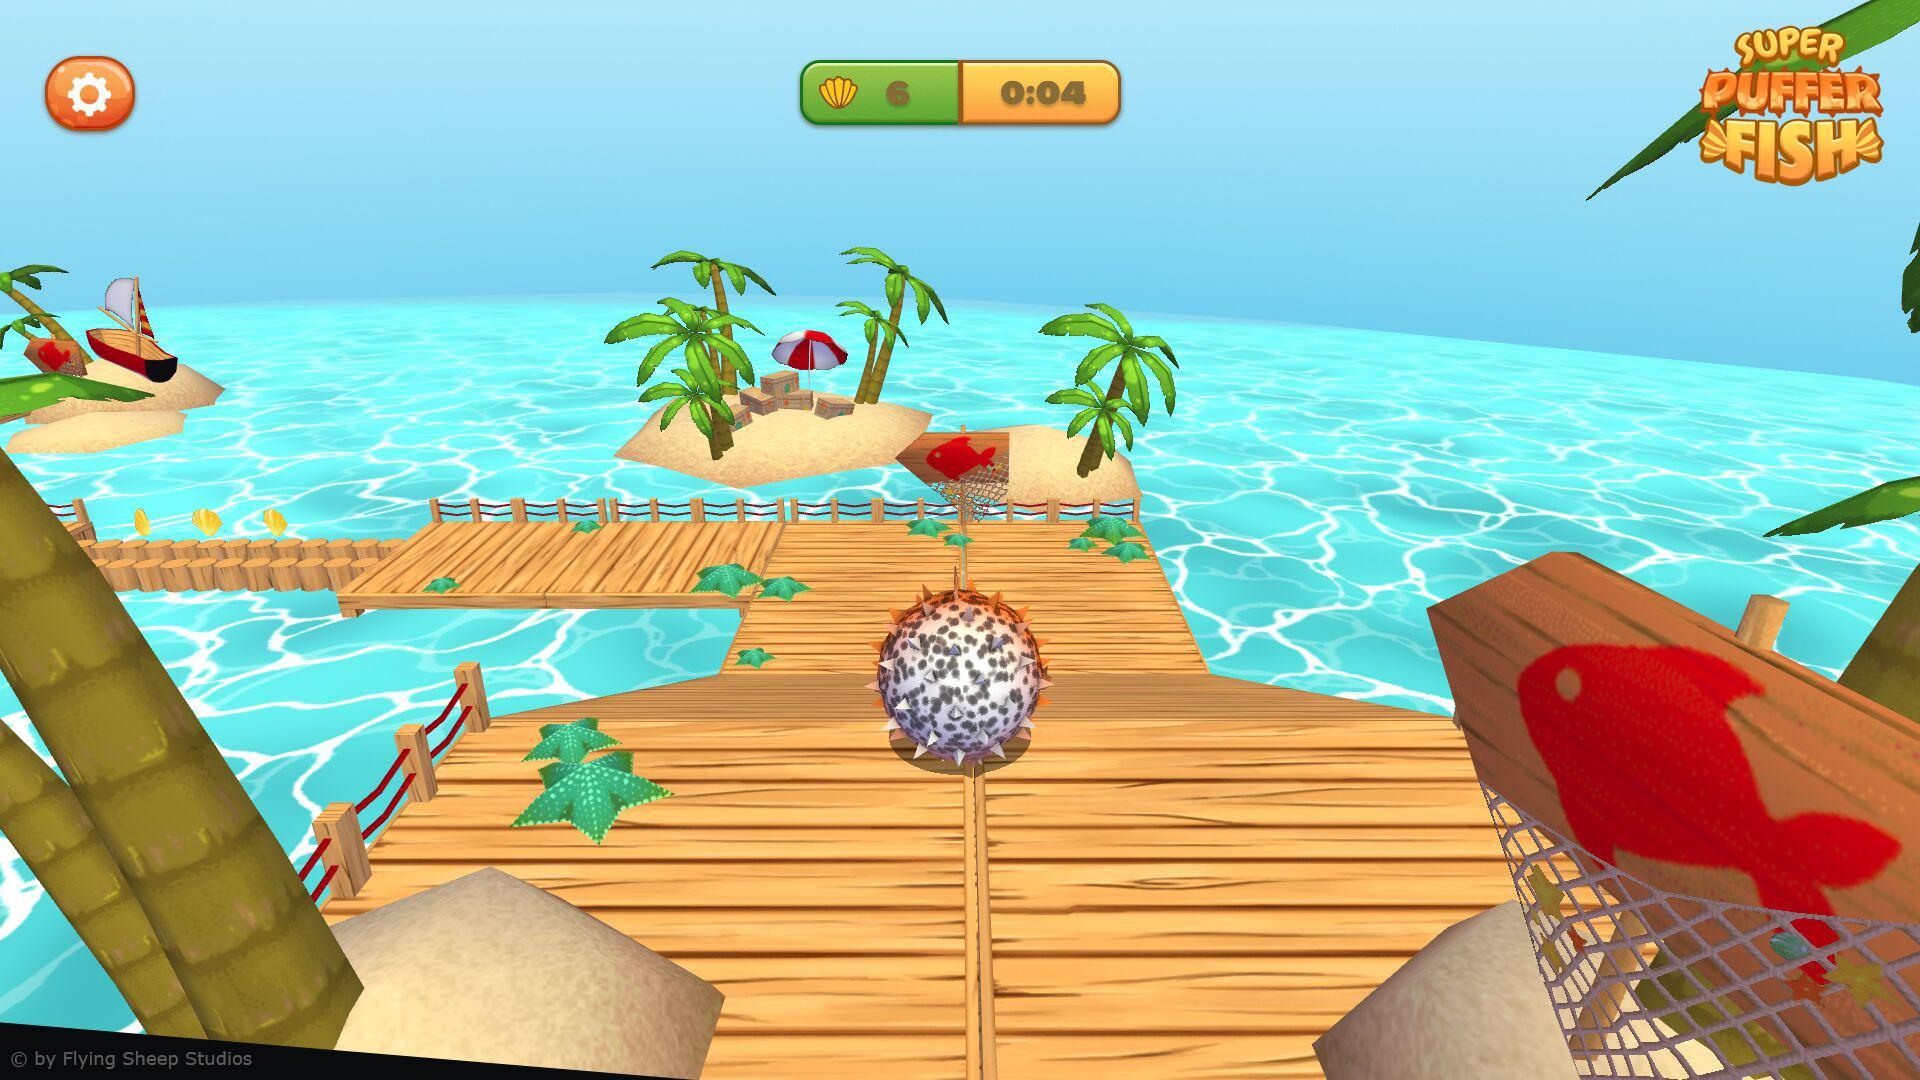 Marina hahn pufferfish screenshot 2